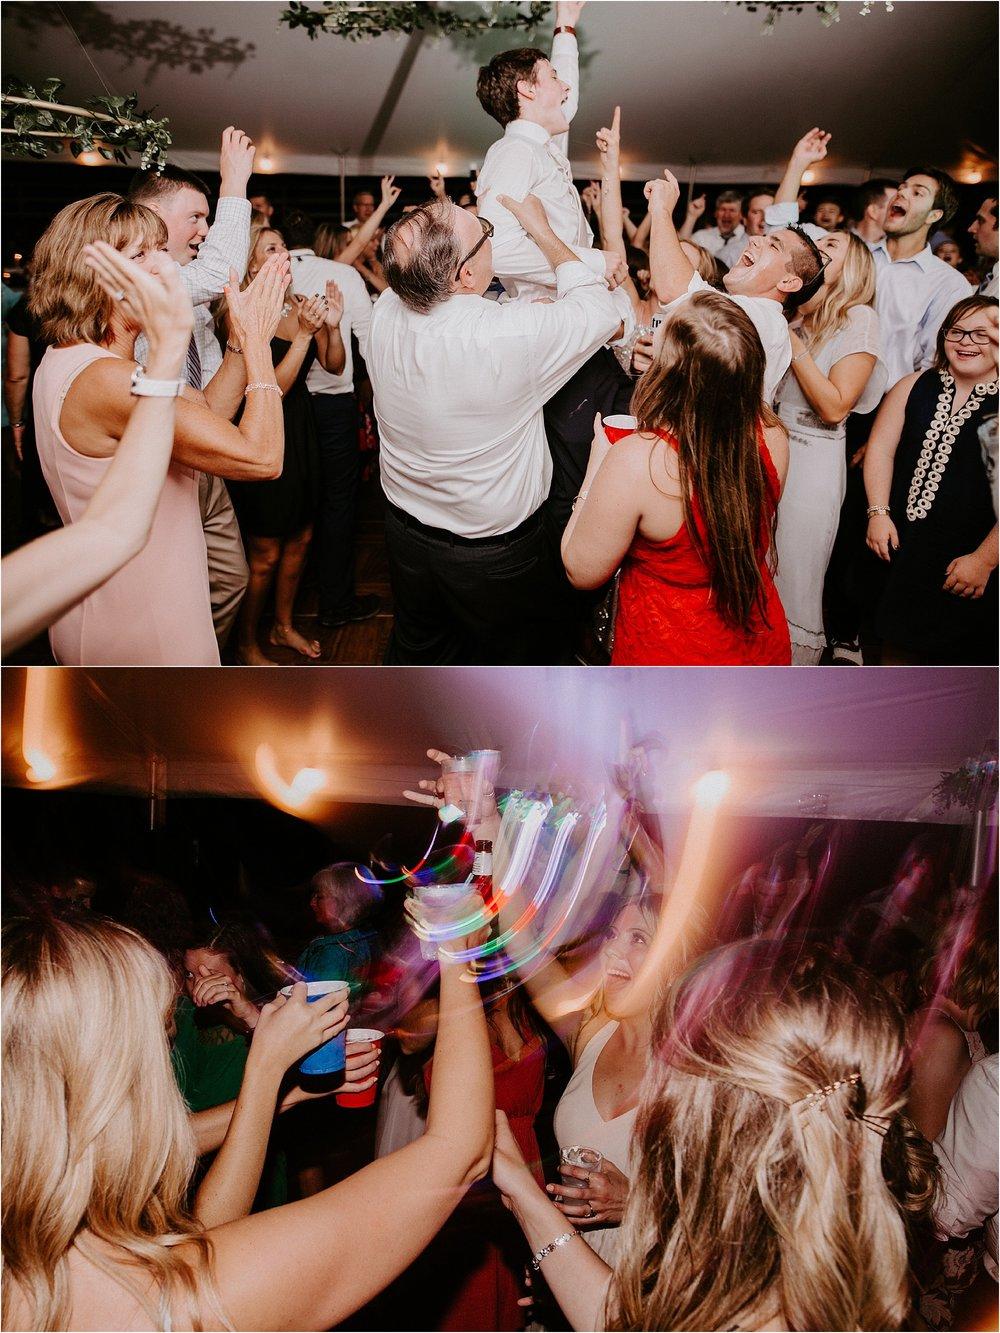 Sarah_Brookhart_Lancaster_Wedding_Photographer_0095.jpg